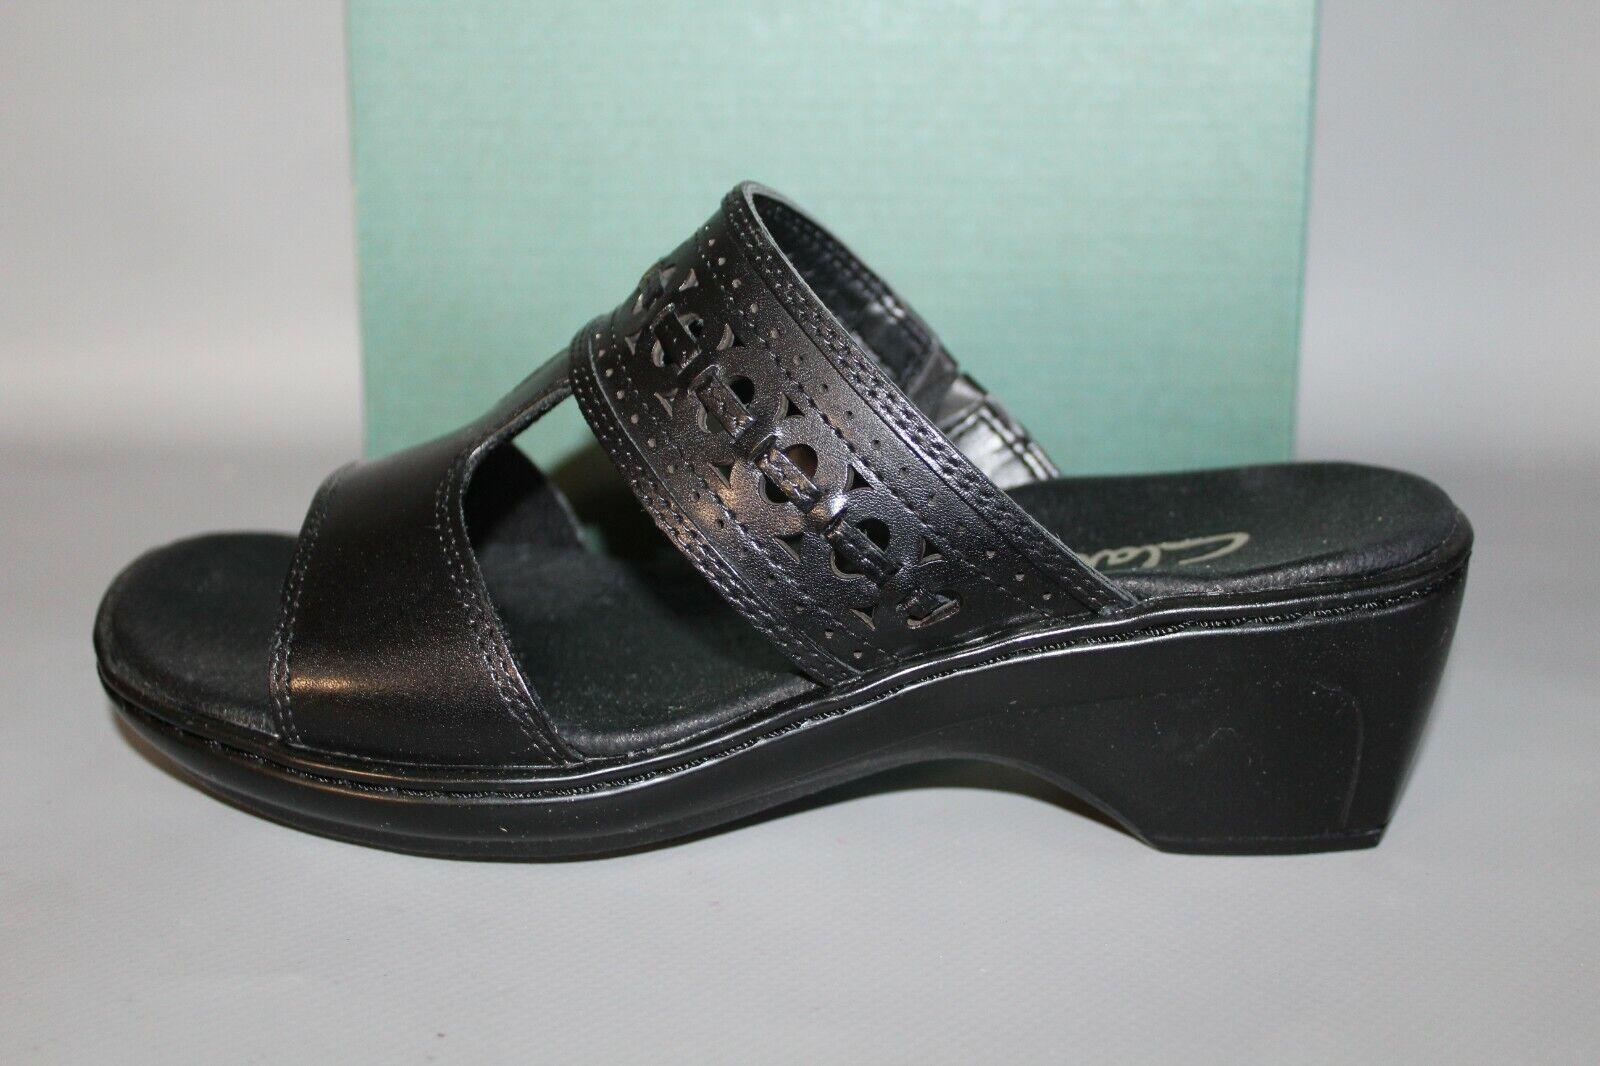 NEW Women's Clarks Dianalyn Black Comfortable Slides